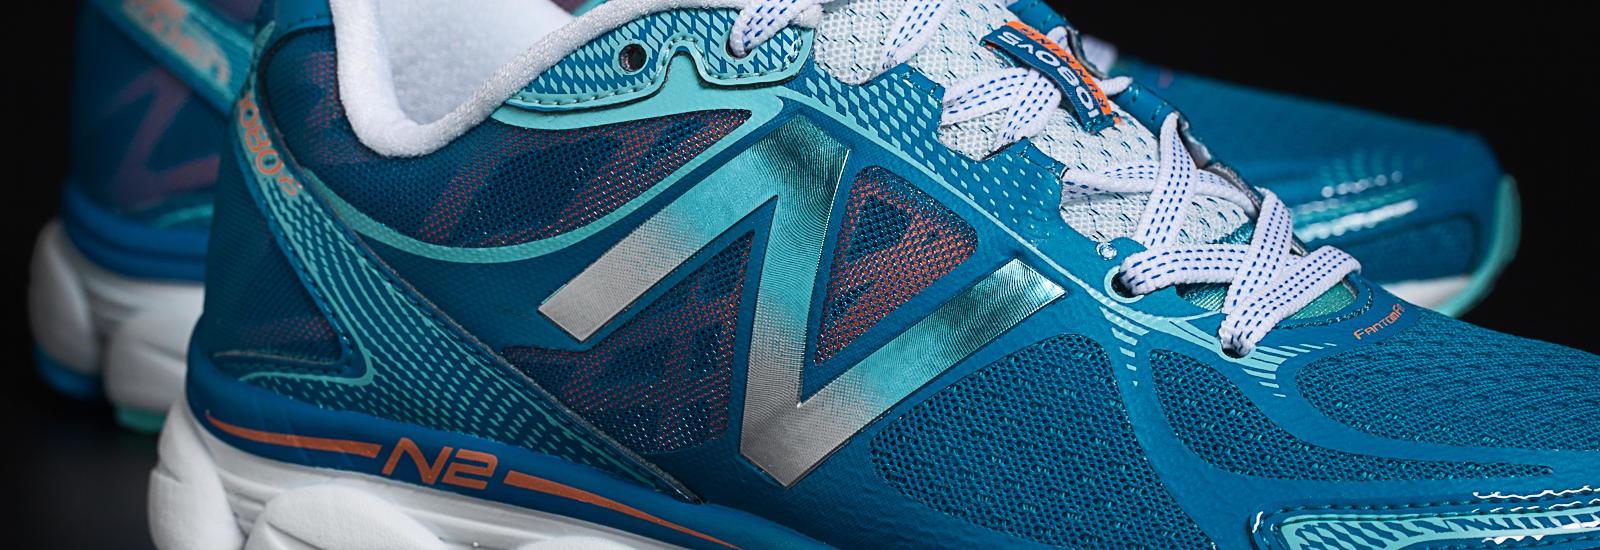 new balance shoes customer service